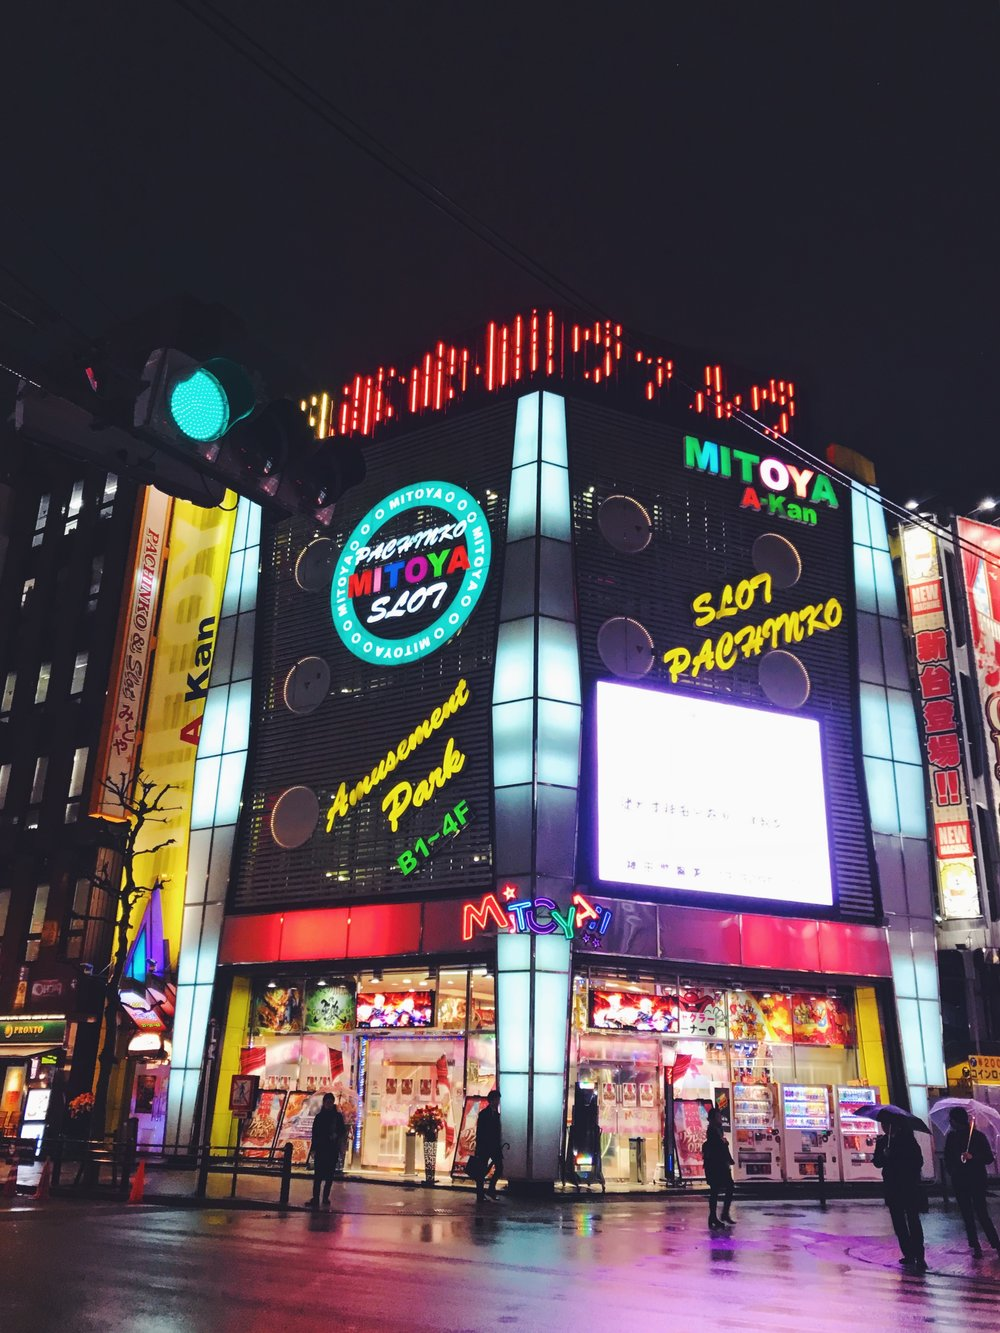 Suidobashi | By Polygon Market